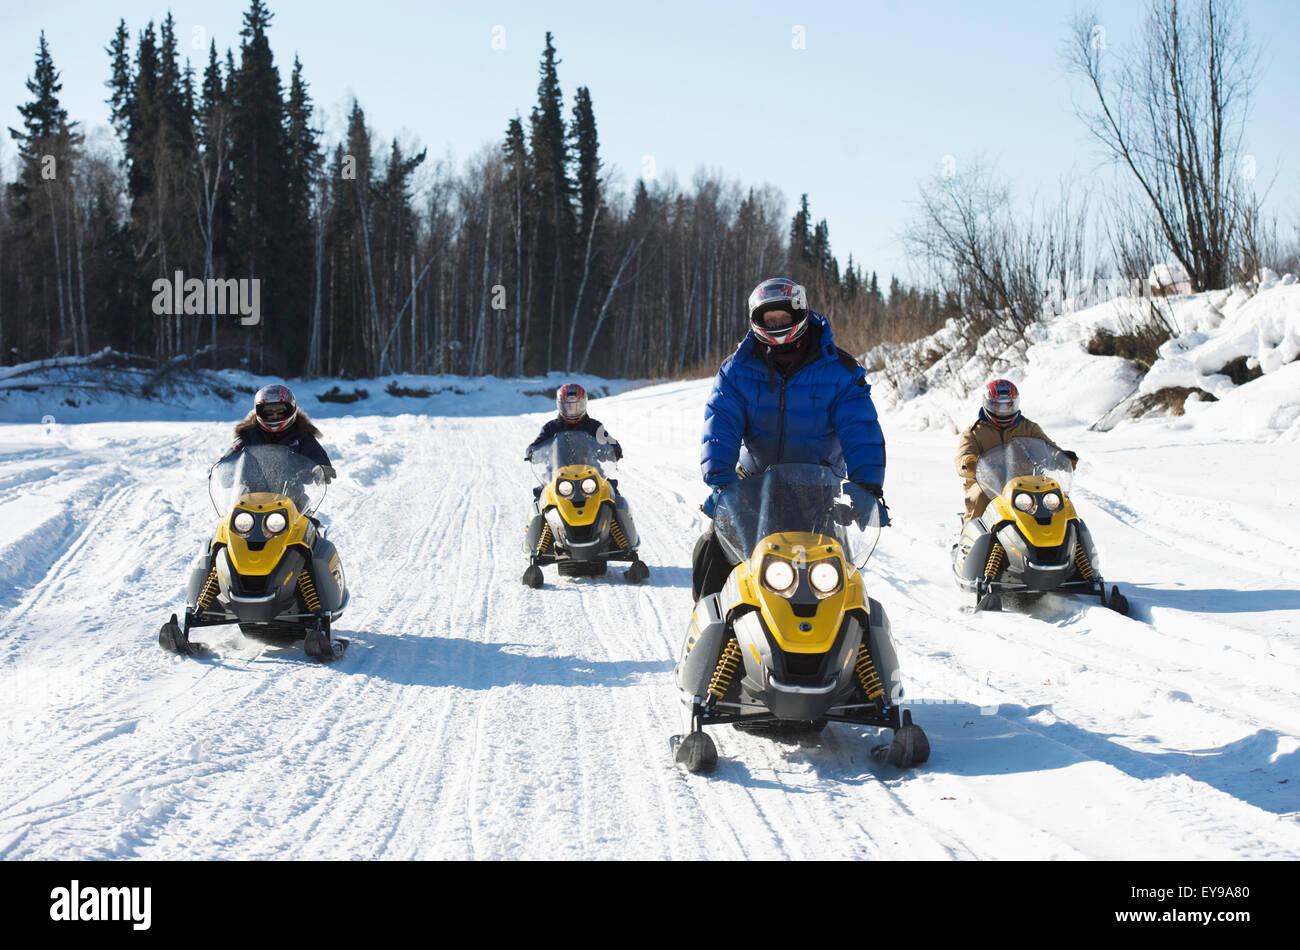 49th Missile Defense Battalion Soldier puts on Snow Machine Safety ...